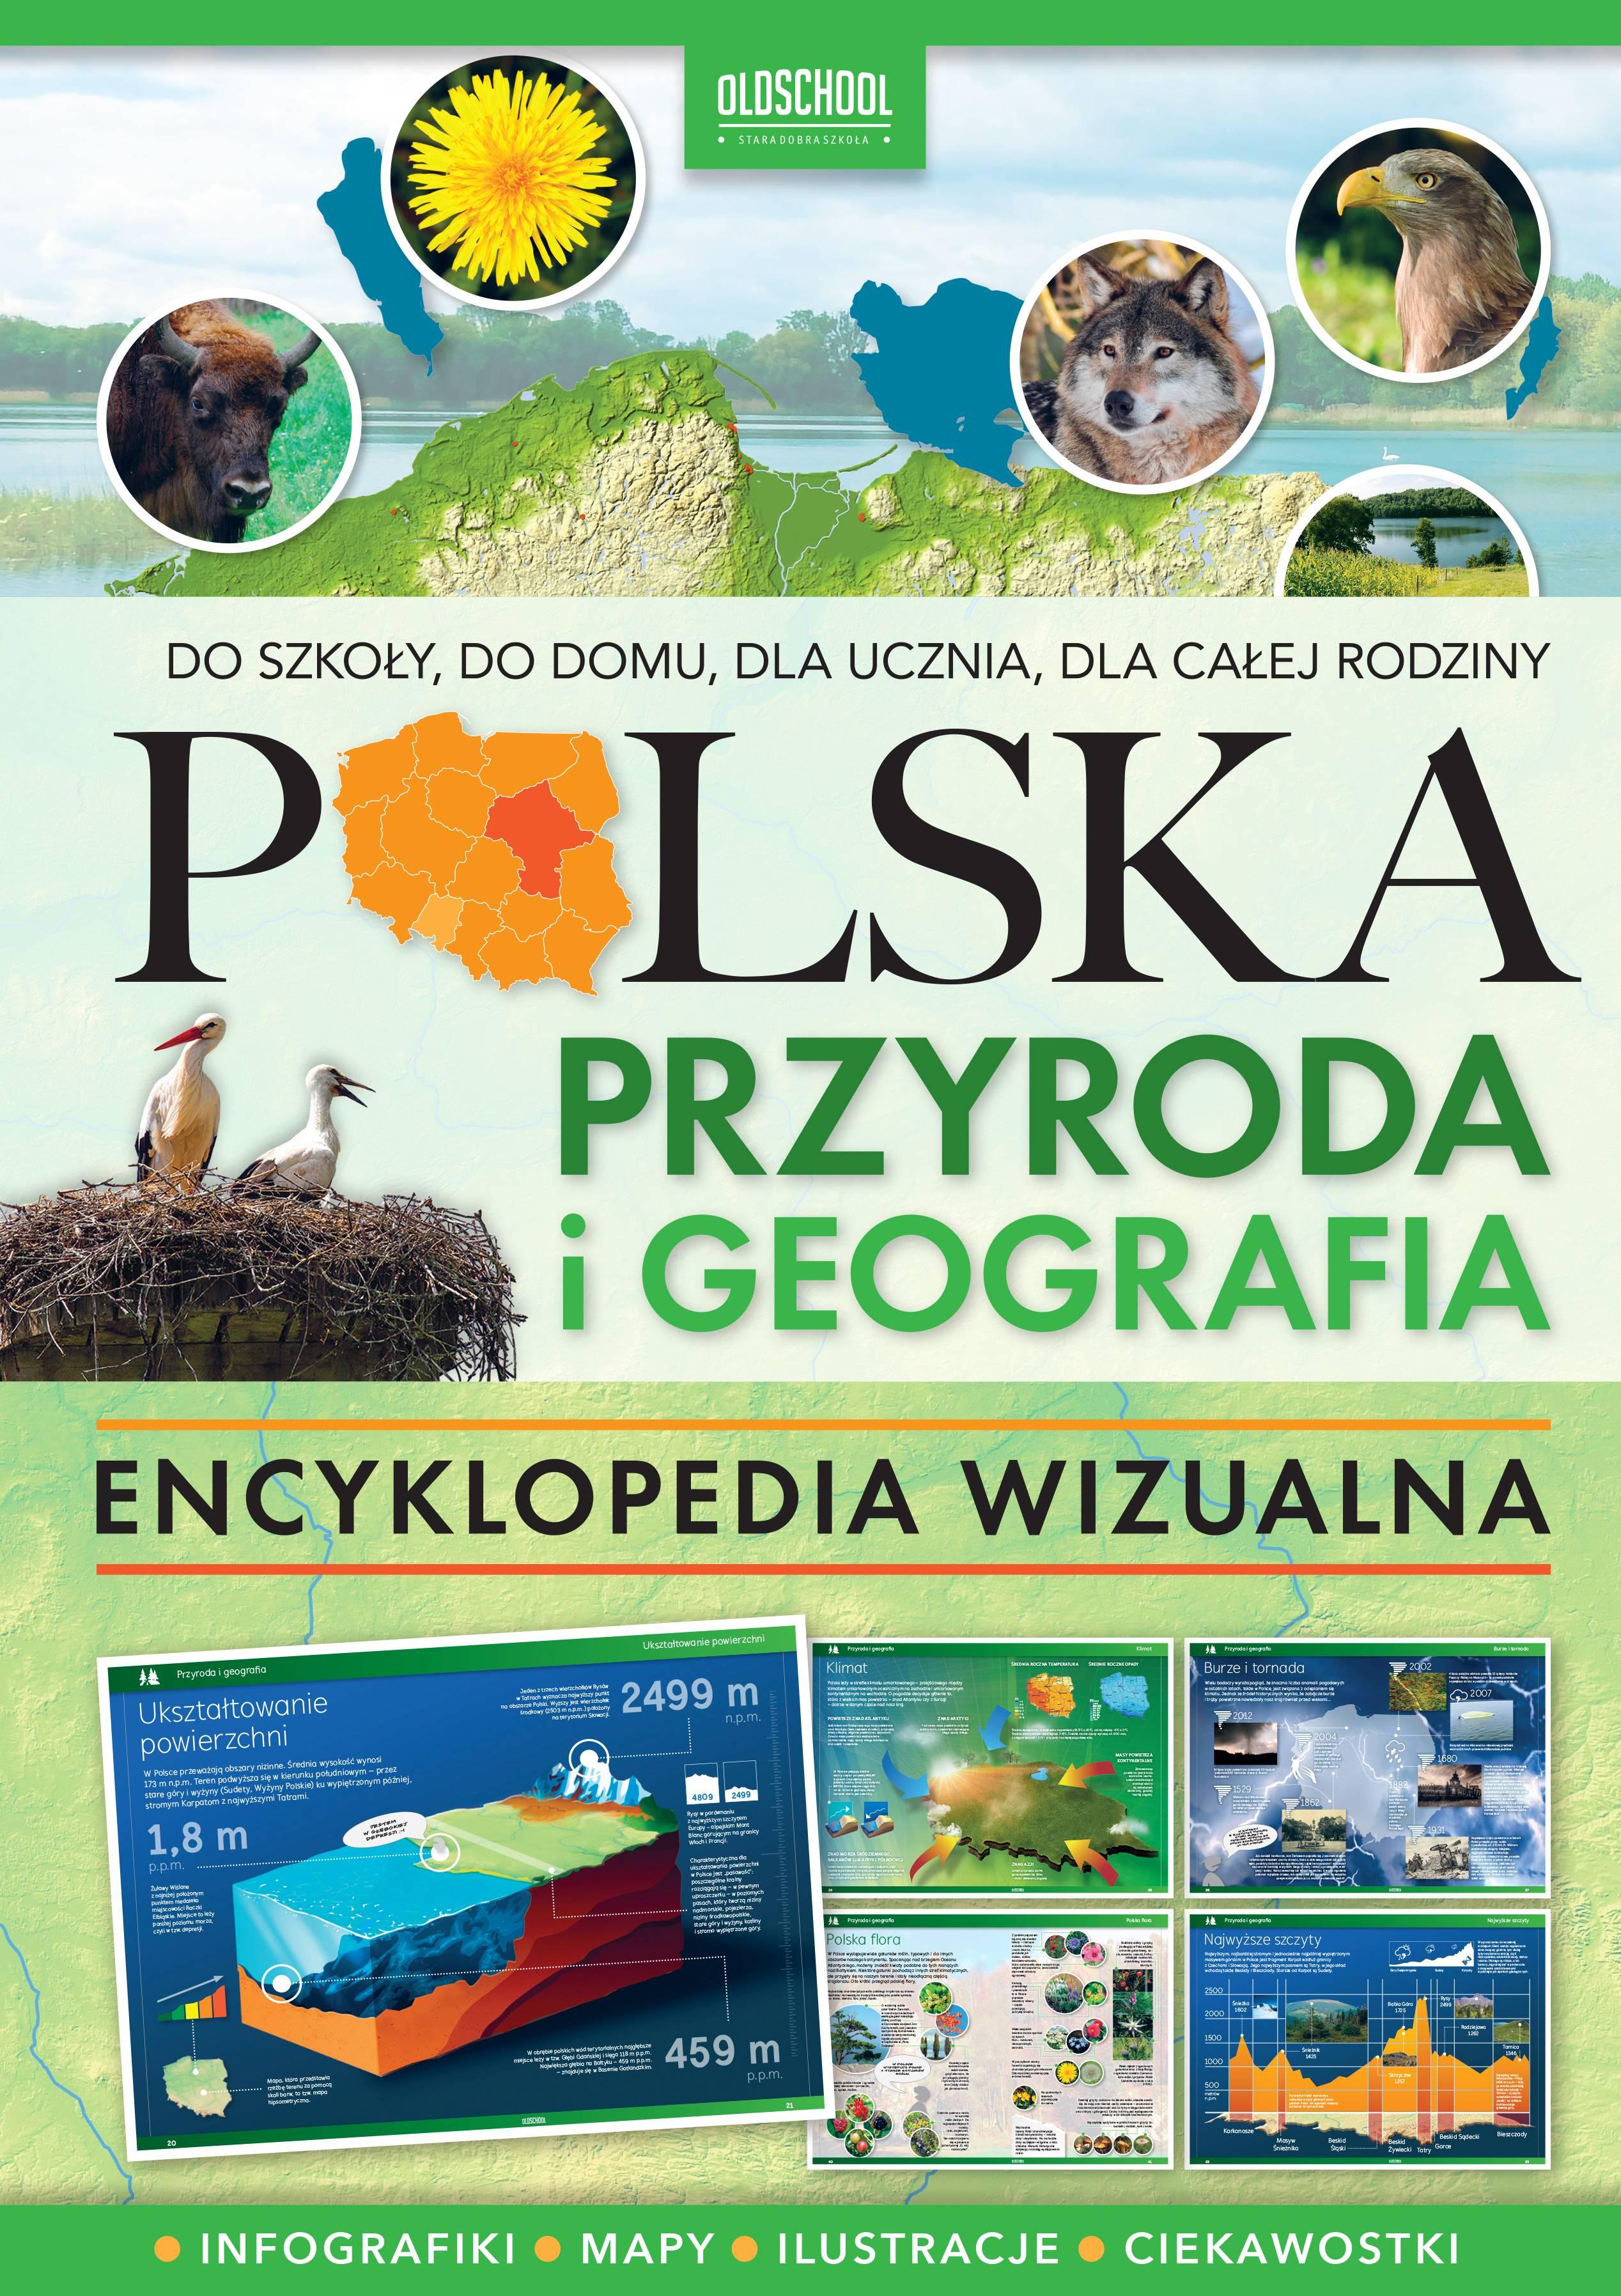 Oldschool_Polska_Przyroda-i-geogr_Encyklopedia-wiz